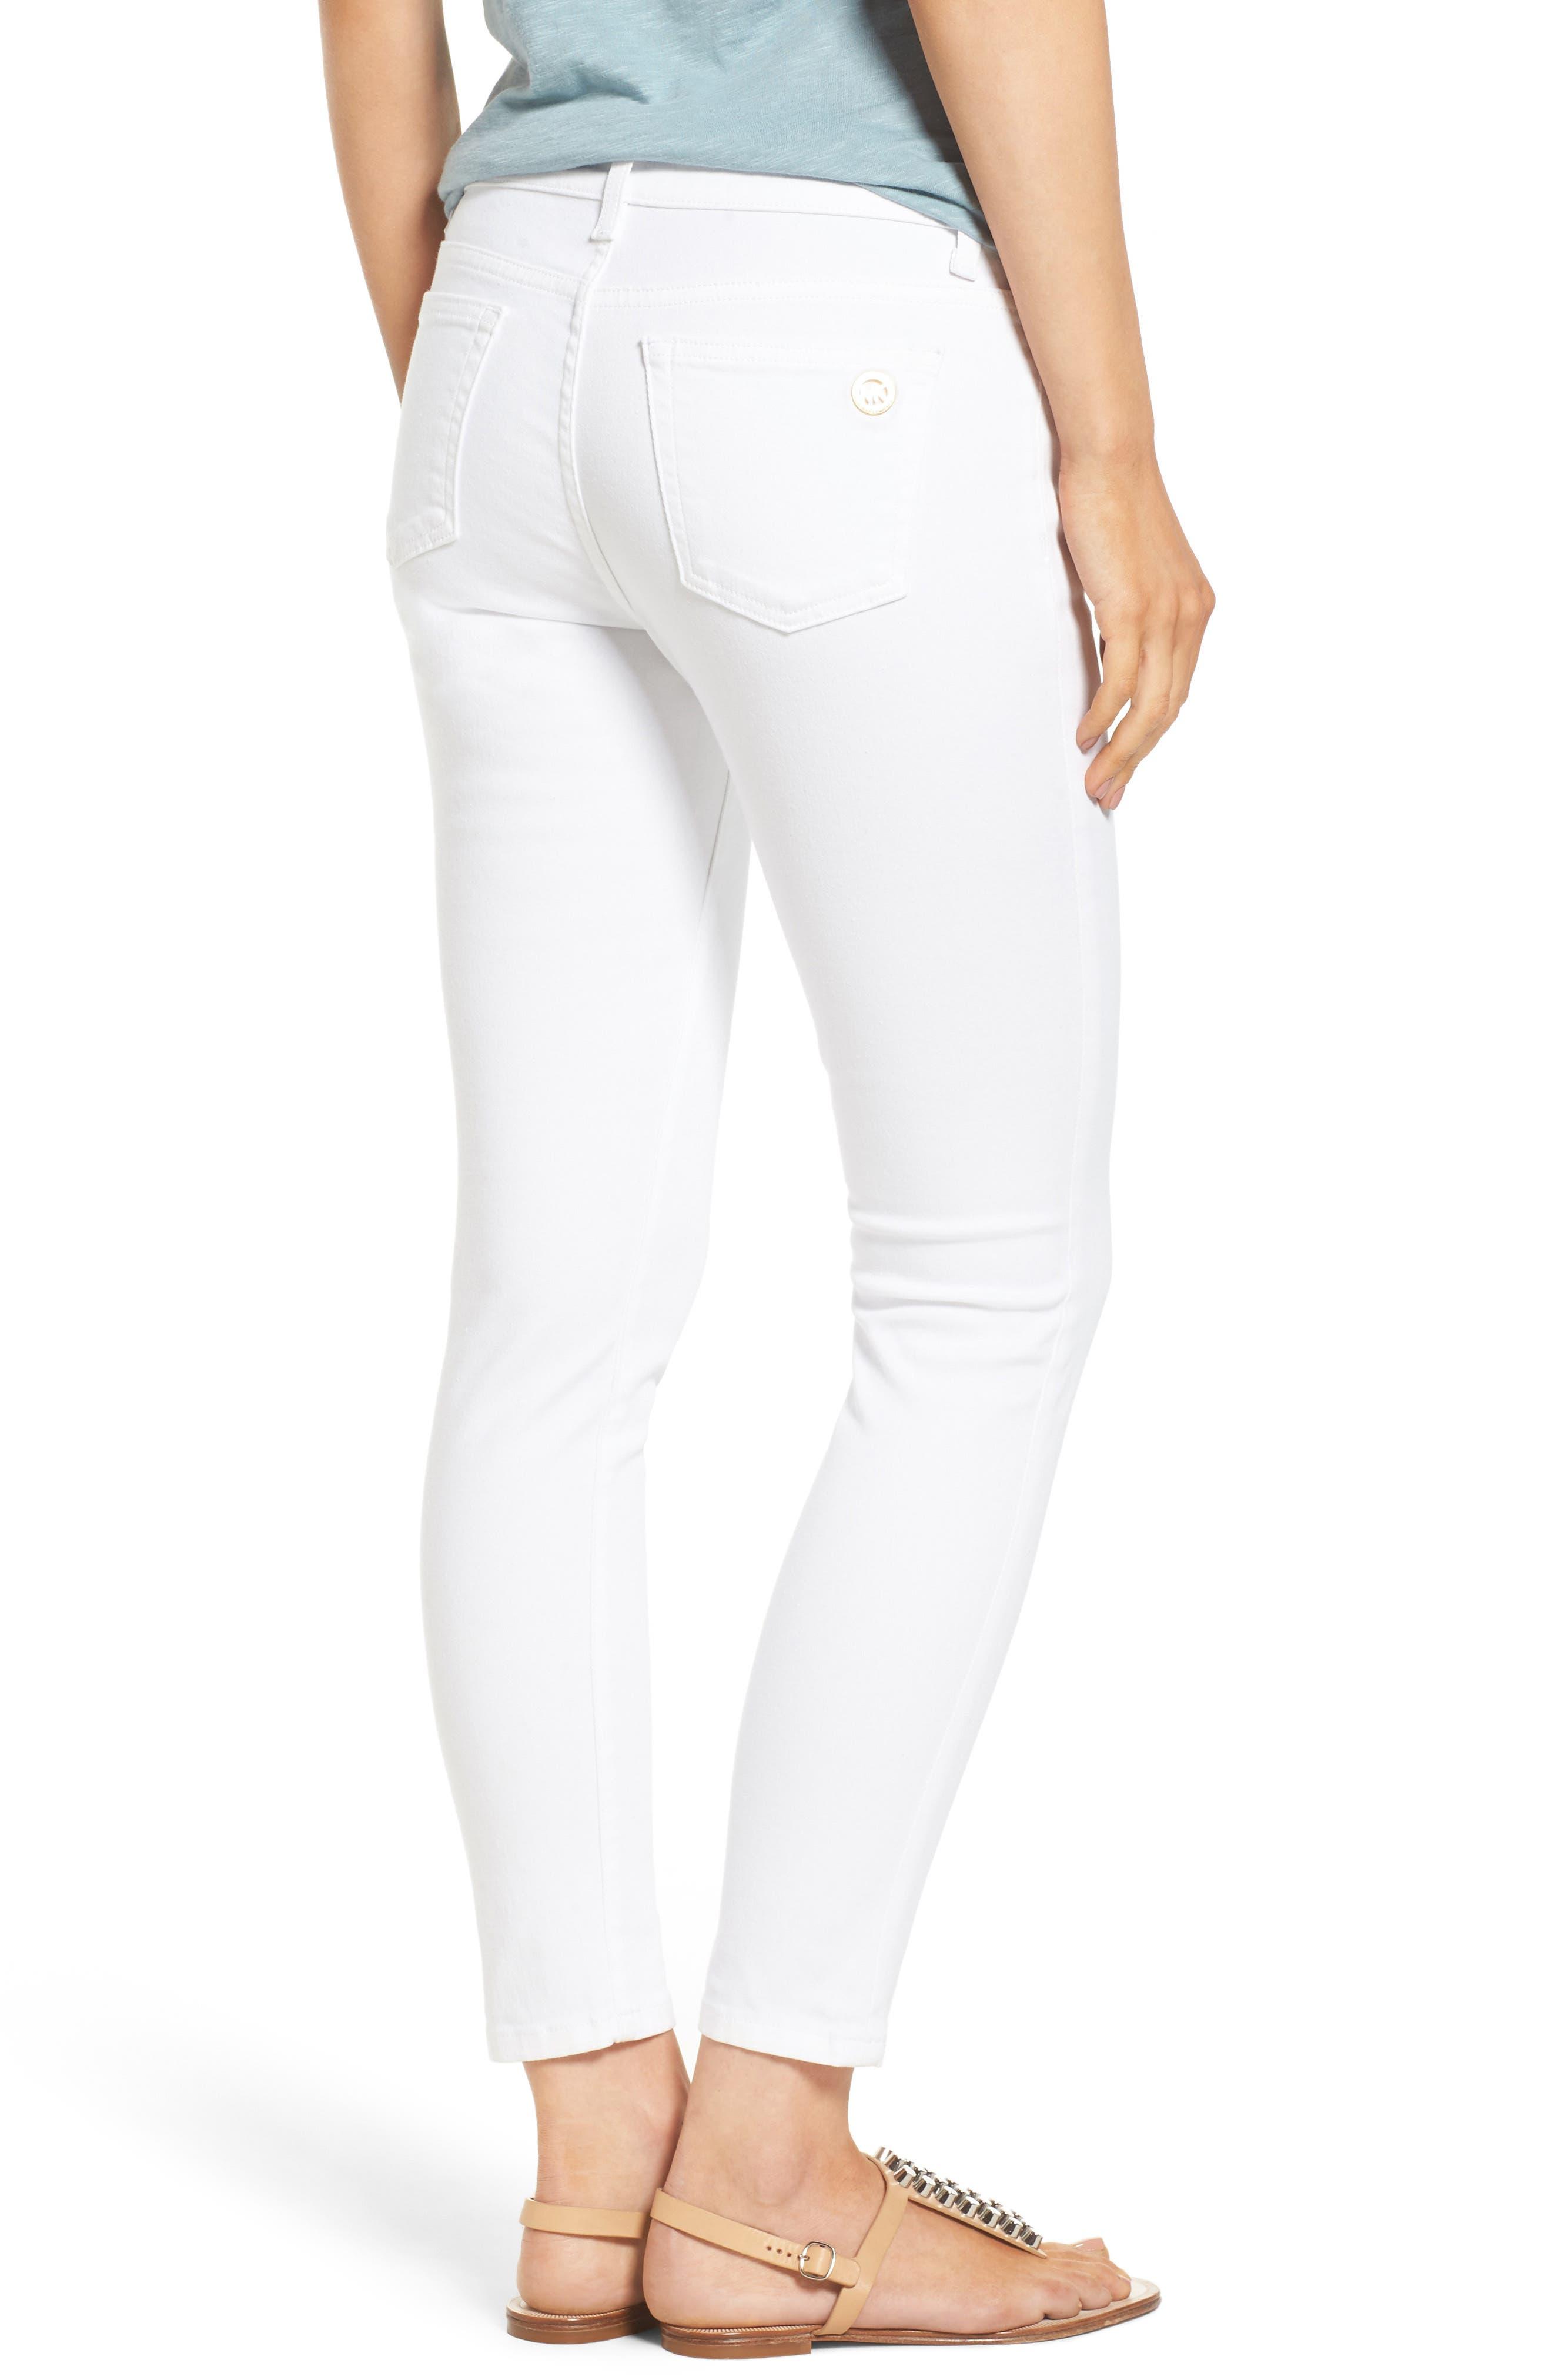 Izzy Ankle Skinny Jeans,                             Alternate thumbnail 2, color,                             100